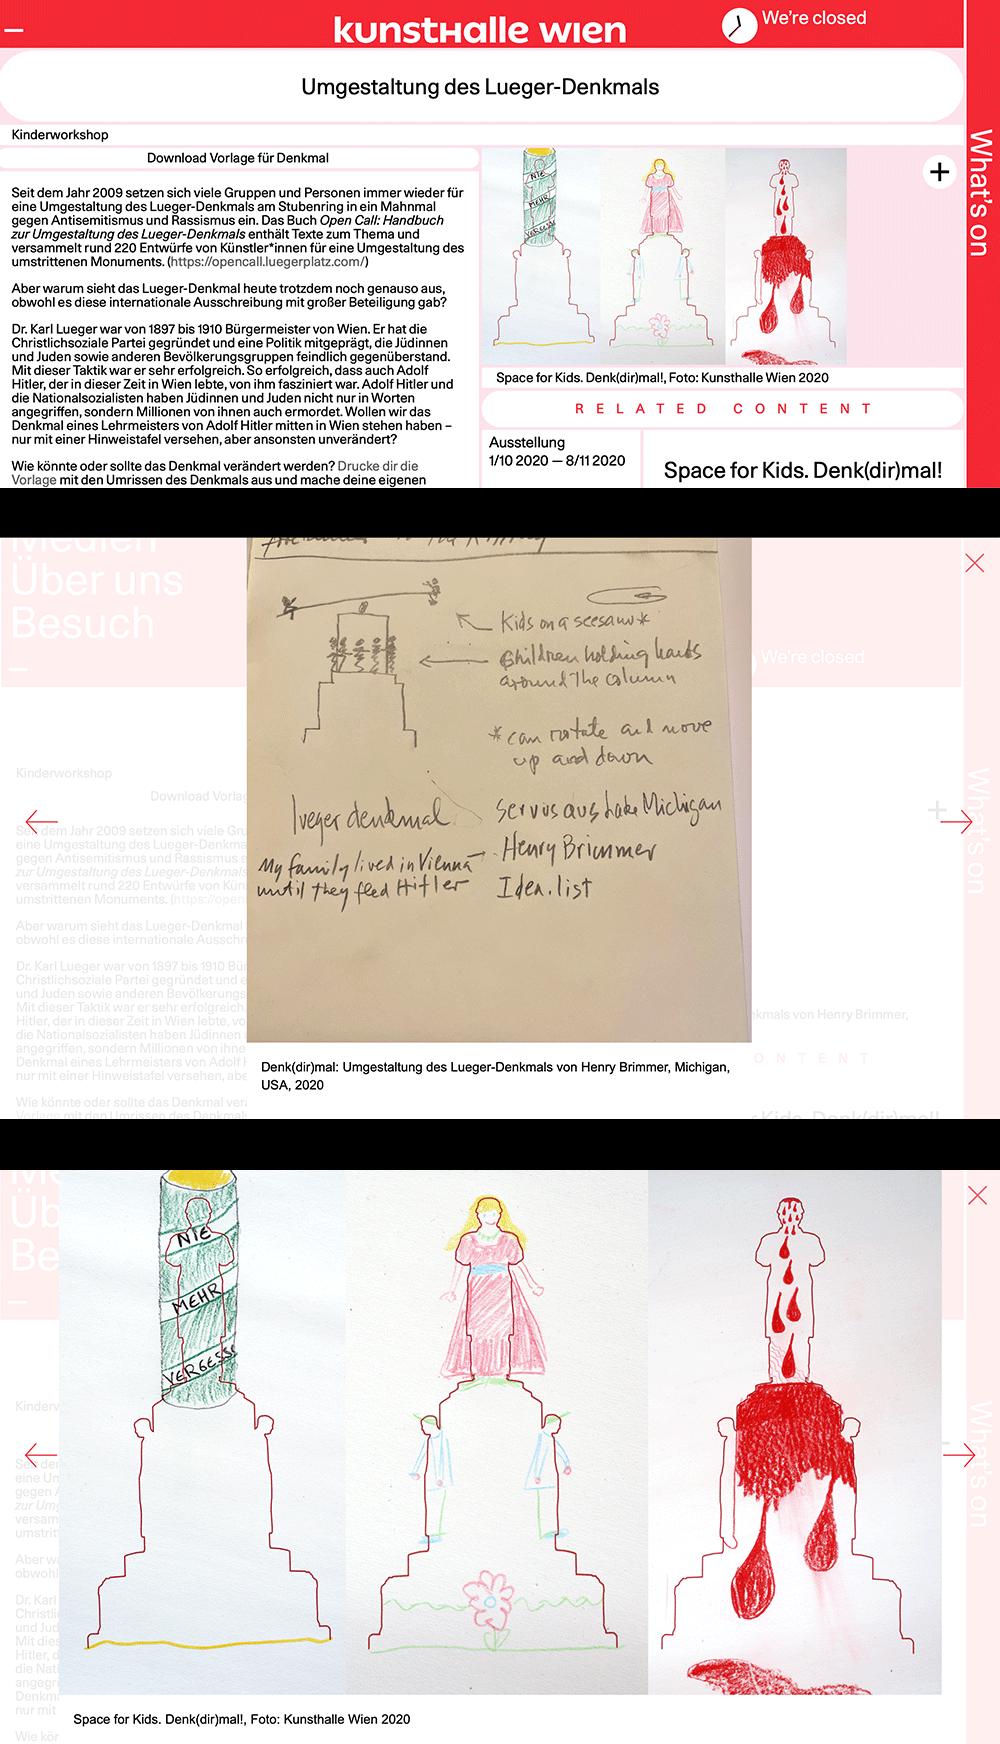 popp-tipp-online-kunsthalle-wien_1